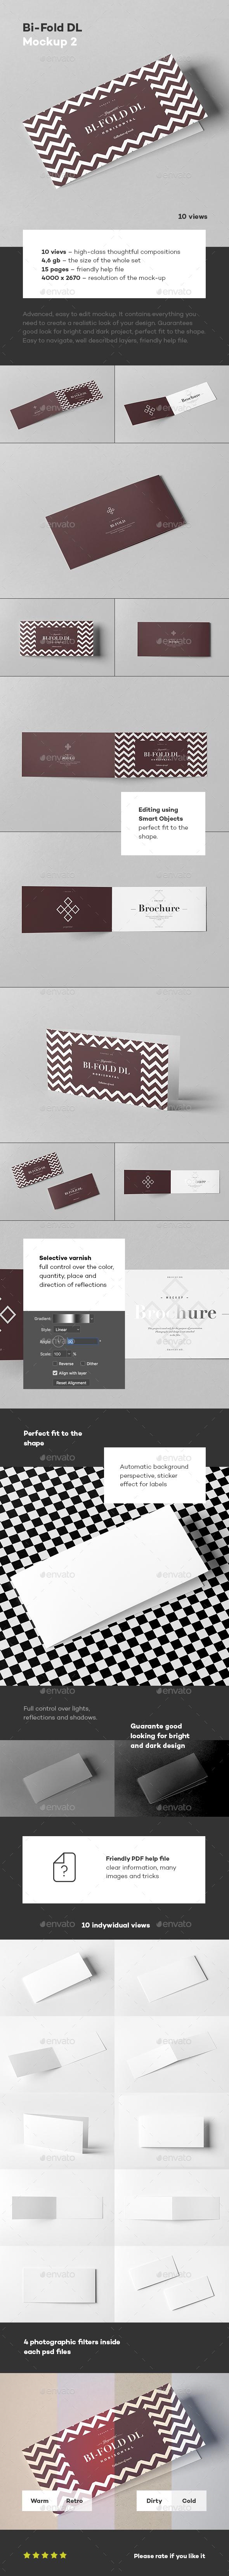 Bi-Fold DL Horizontal Brochure 2 - Brochures Print